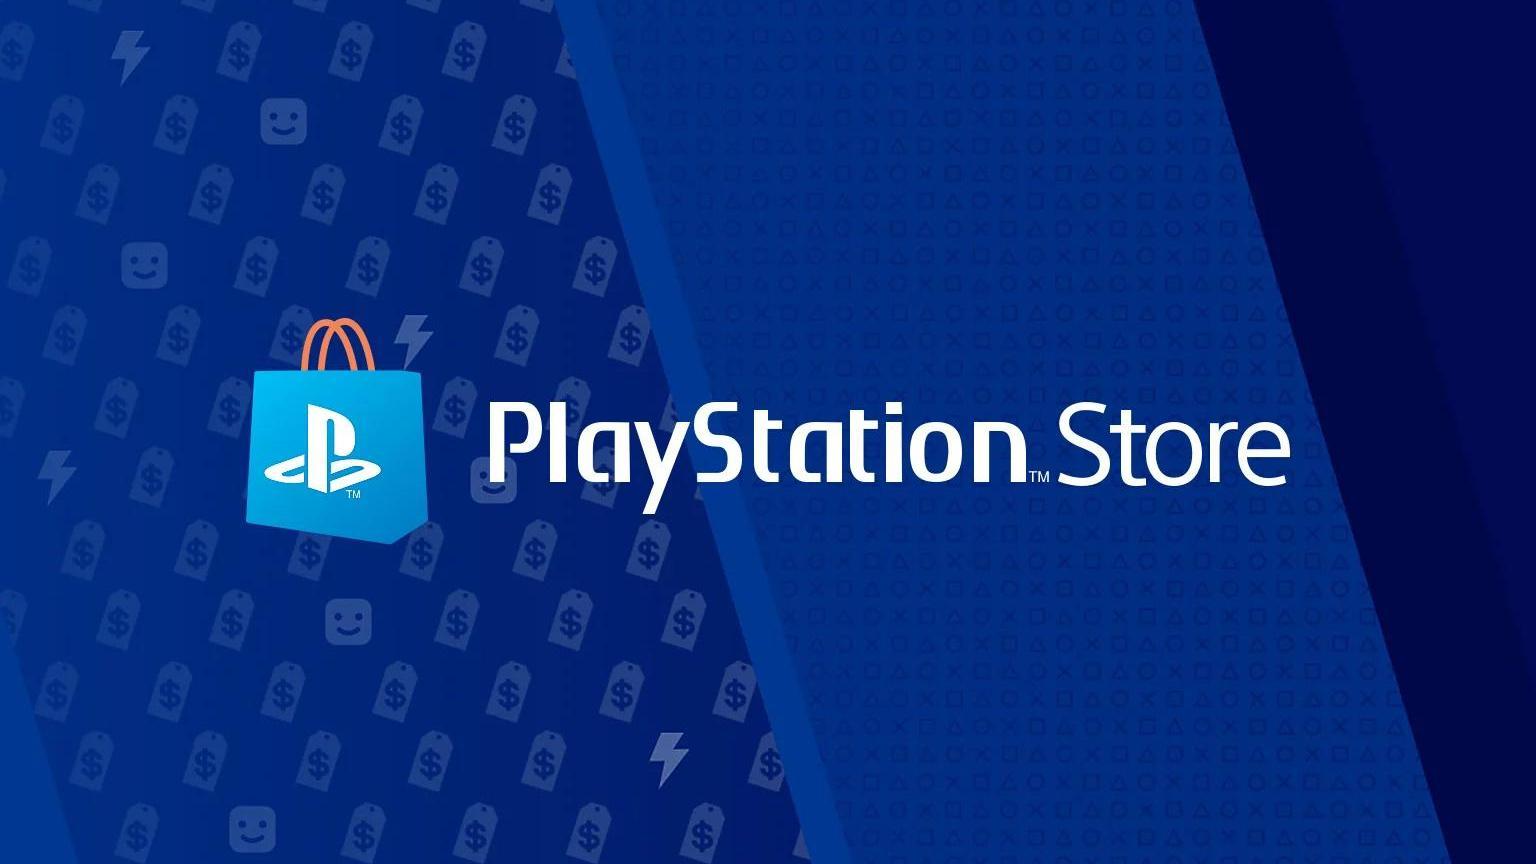 В Playstation Store стартовала распродажа Essential Picks